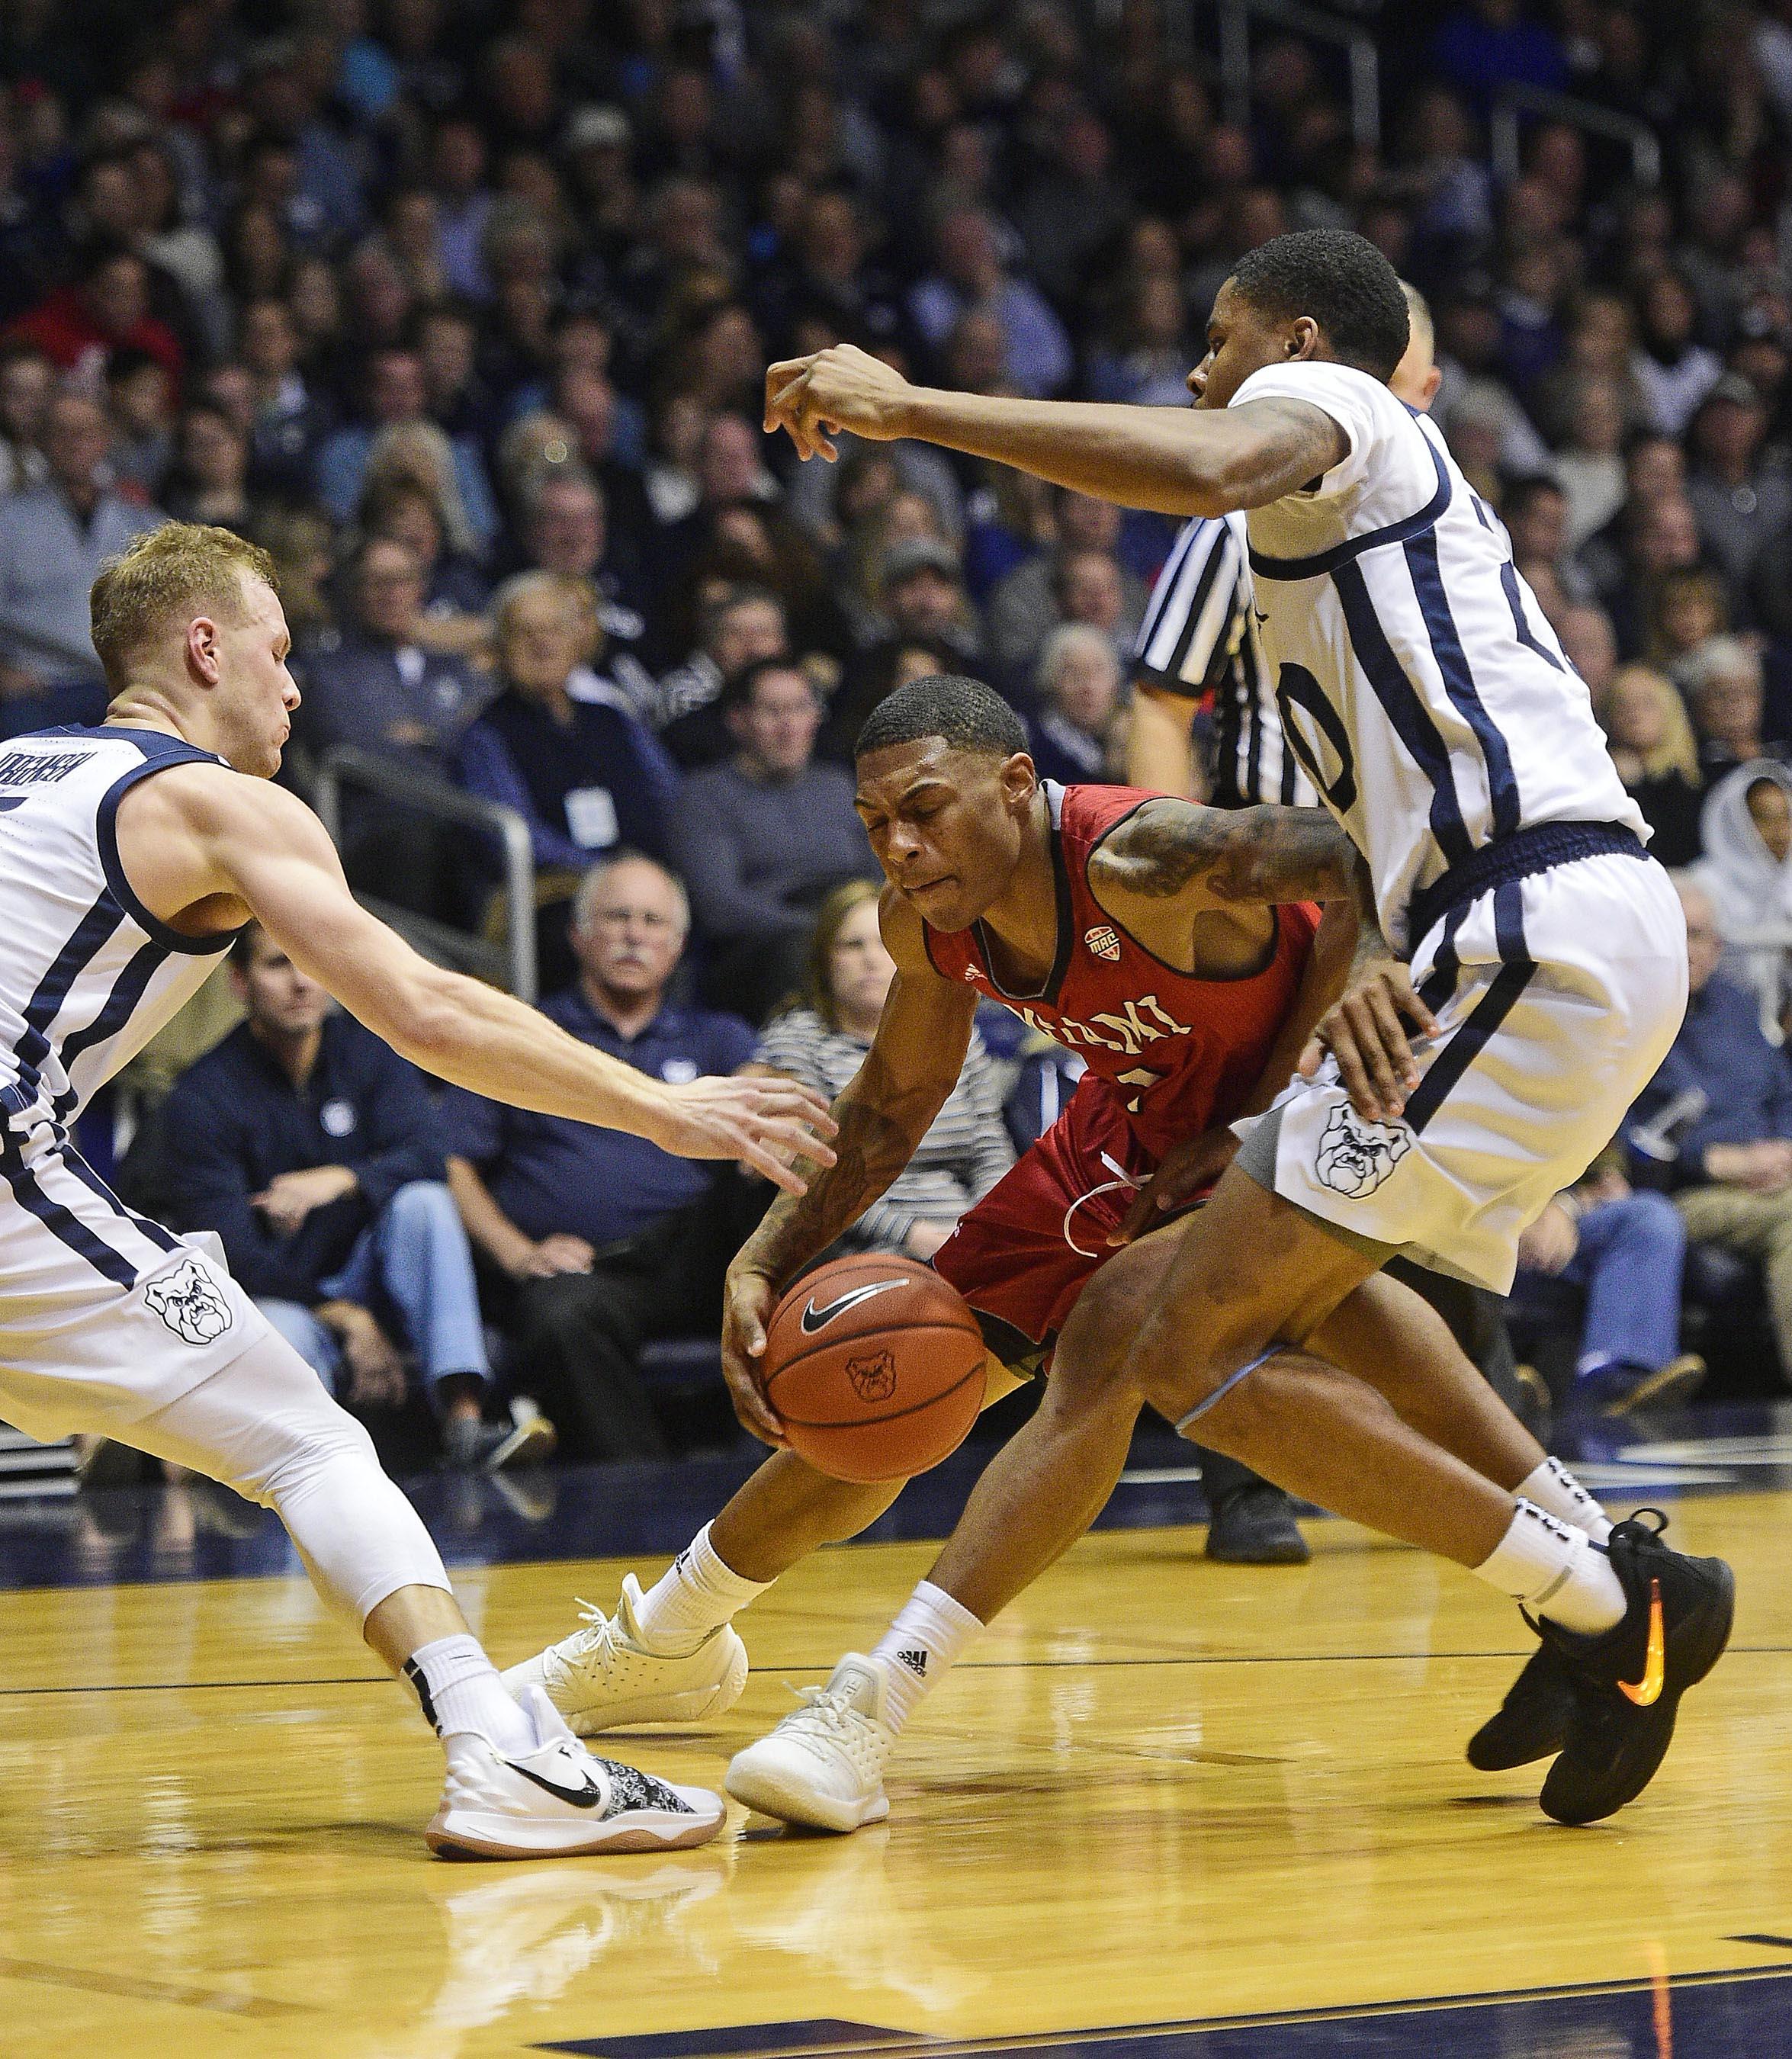 NCAA篮球:迈阿密(哦)巴特勒